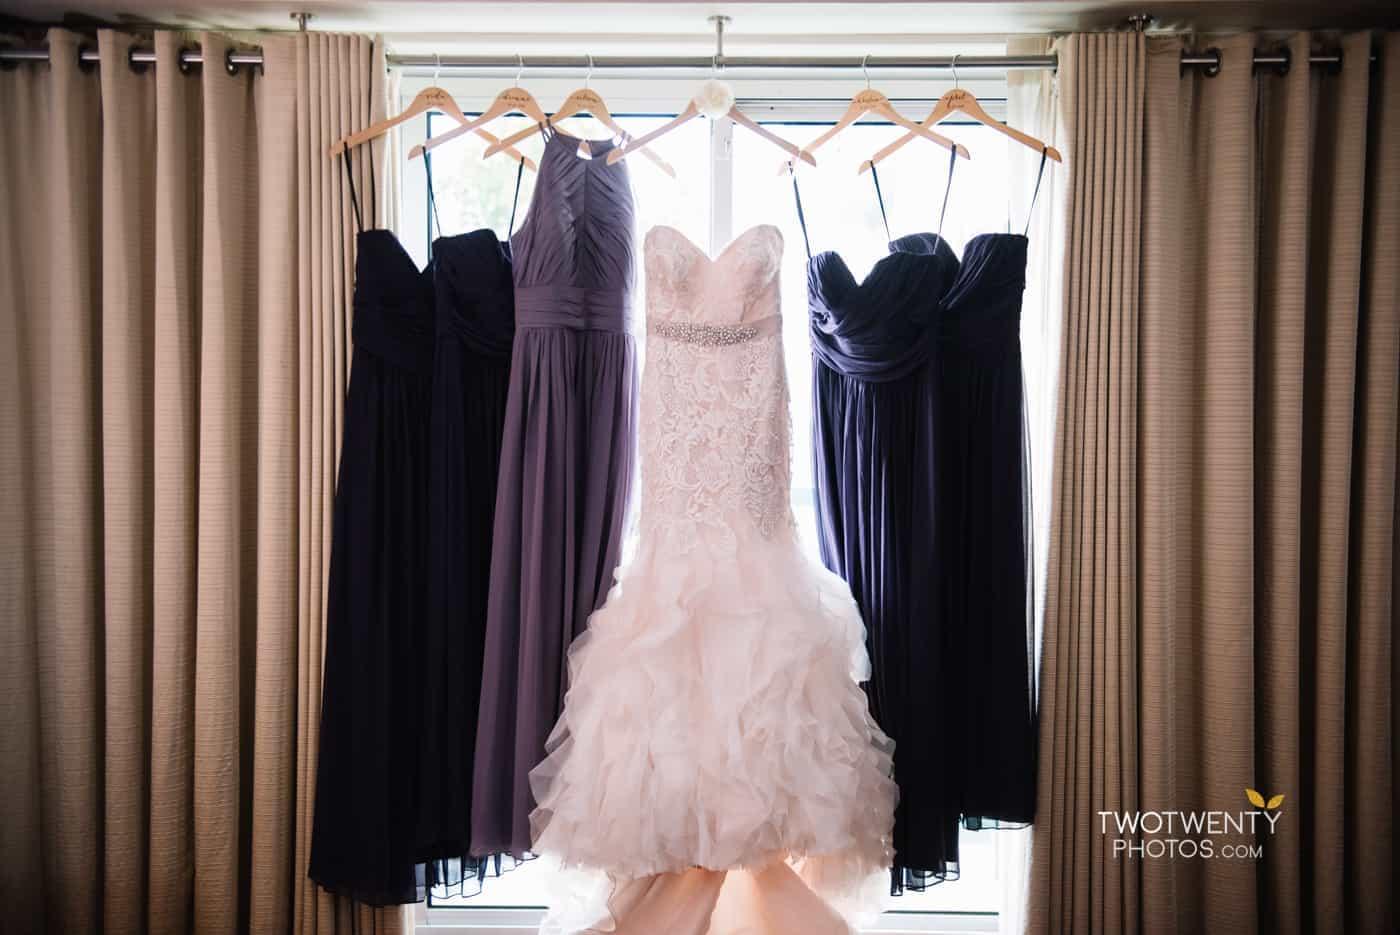 hyatt-regency-downtown-sacramento-wedding-photographer-2